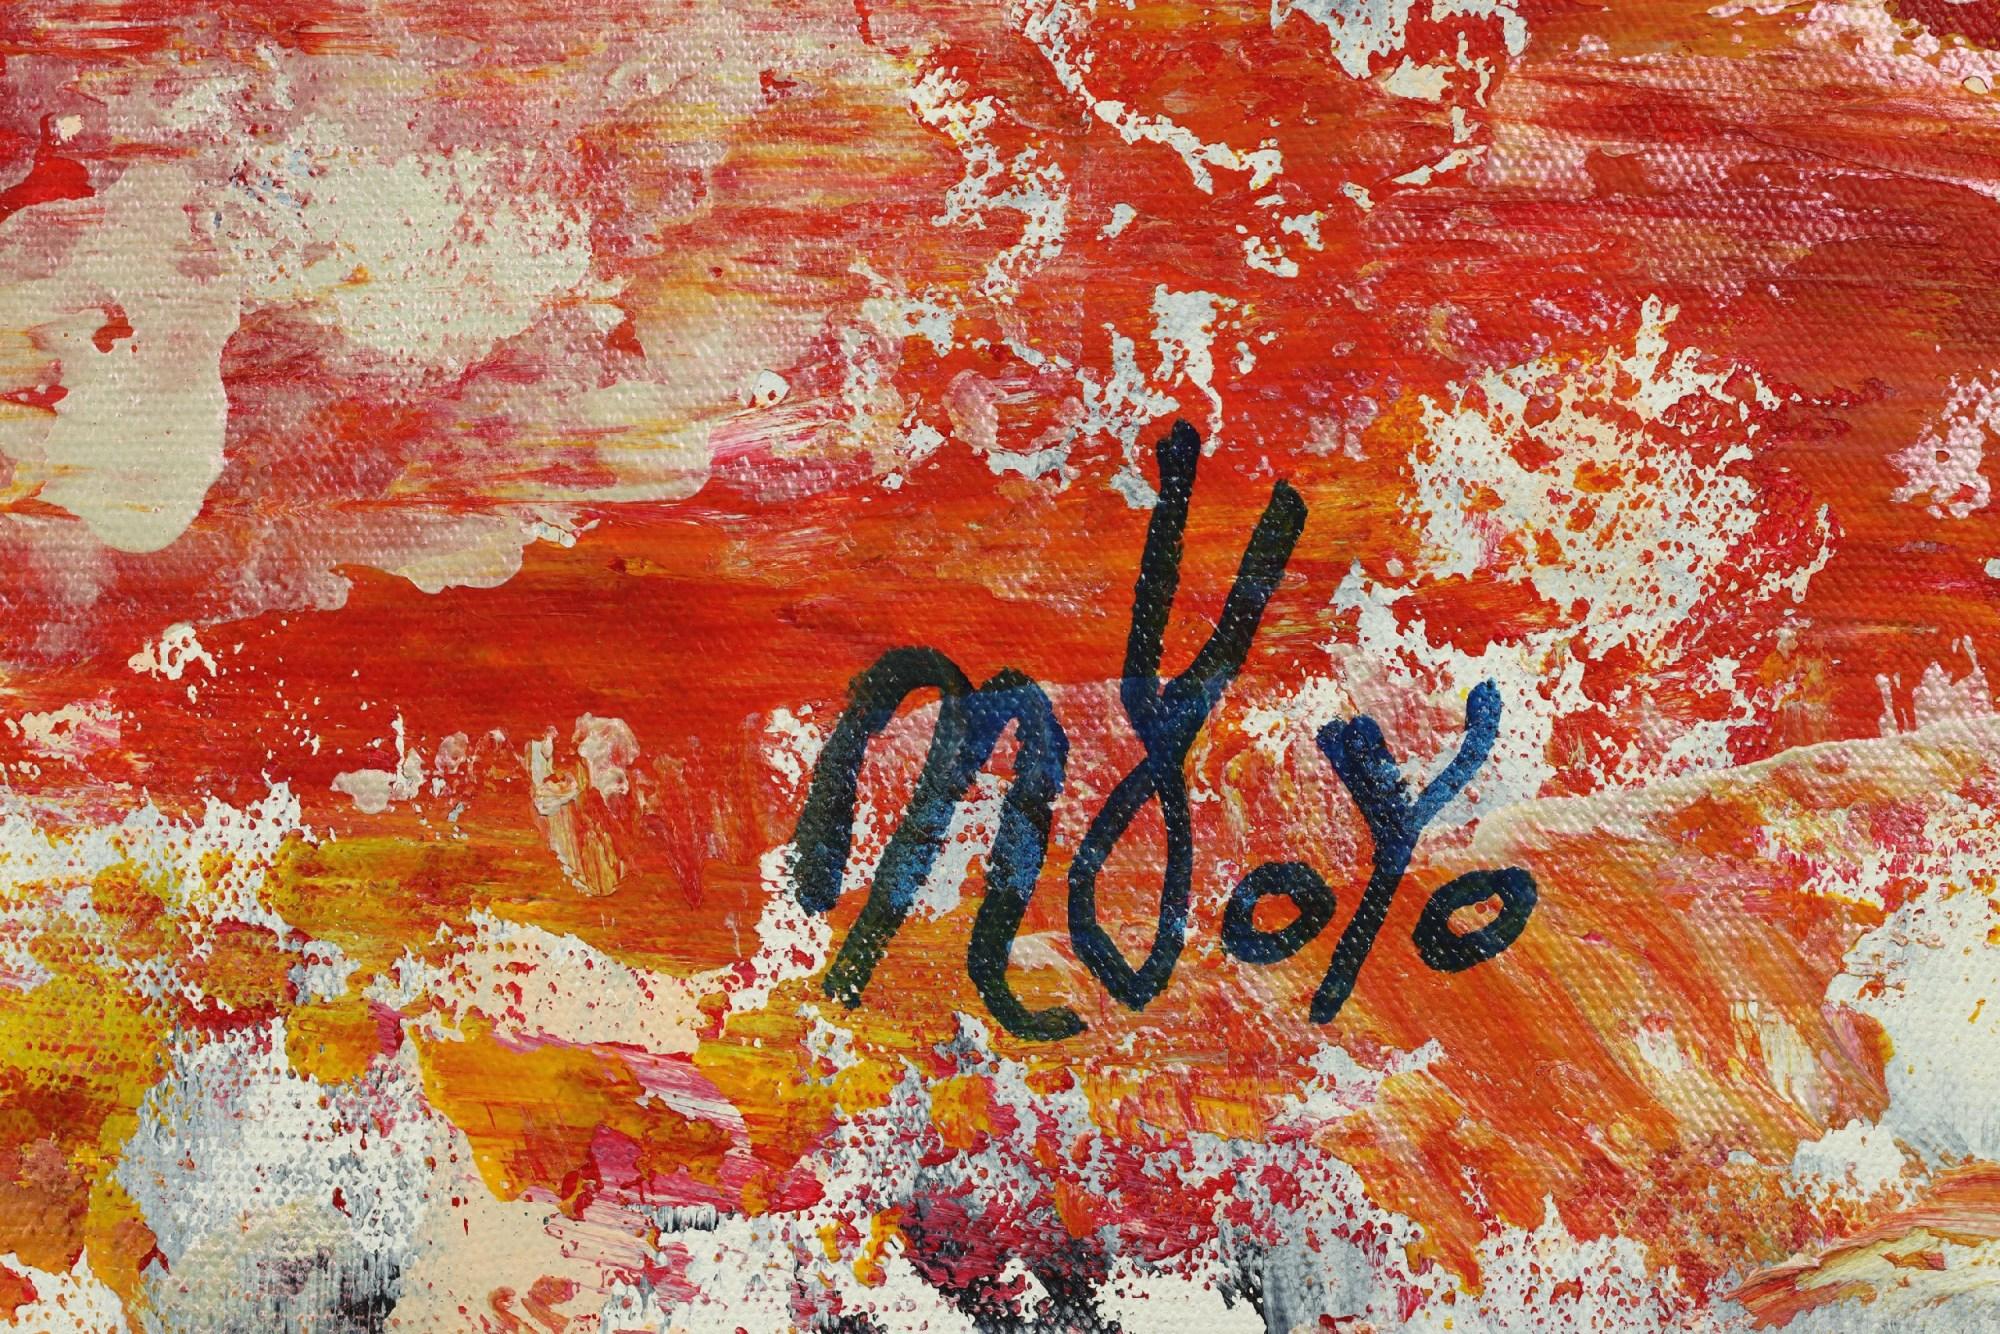 Signature / Side View / Somewhere in Between (Orange refractions) (2021) / Artist: Nestor Toro